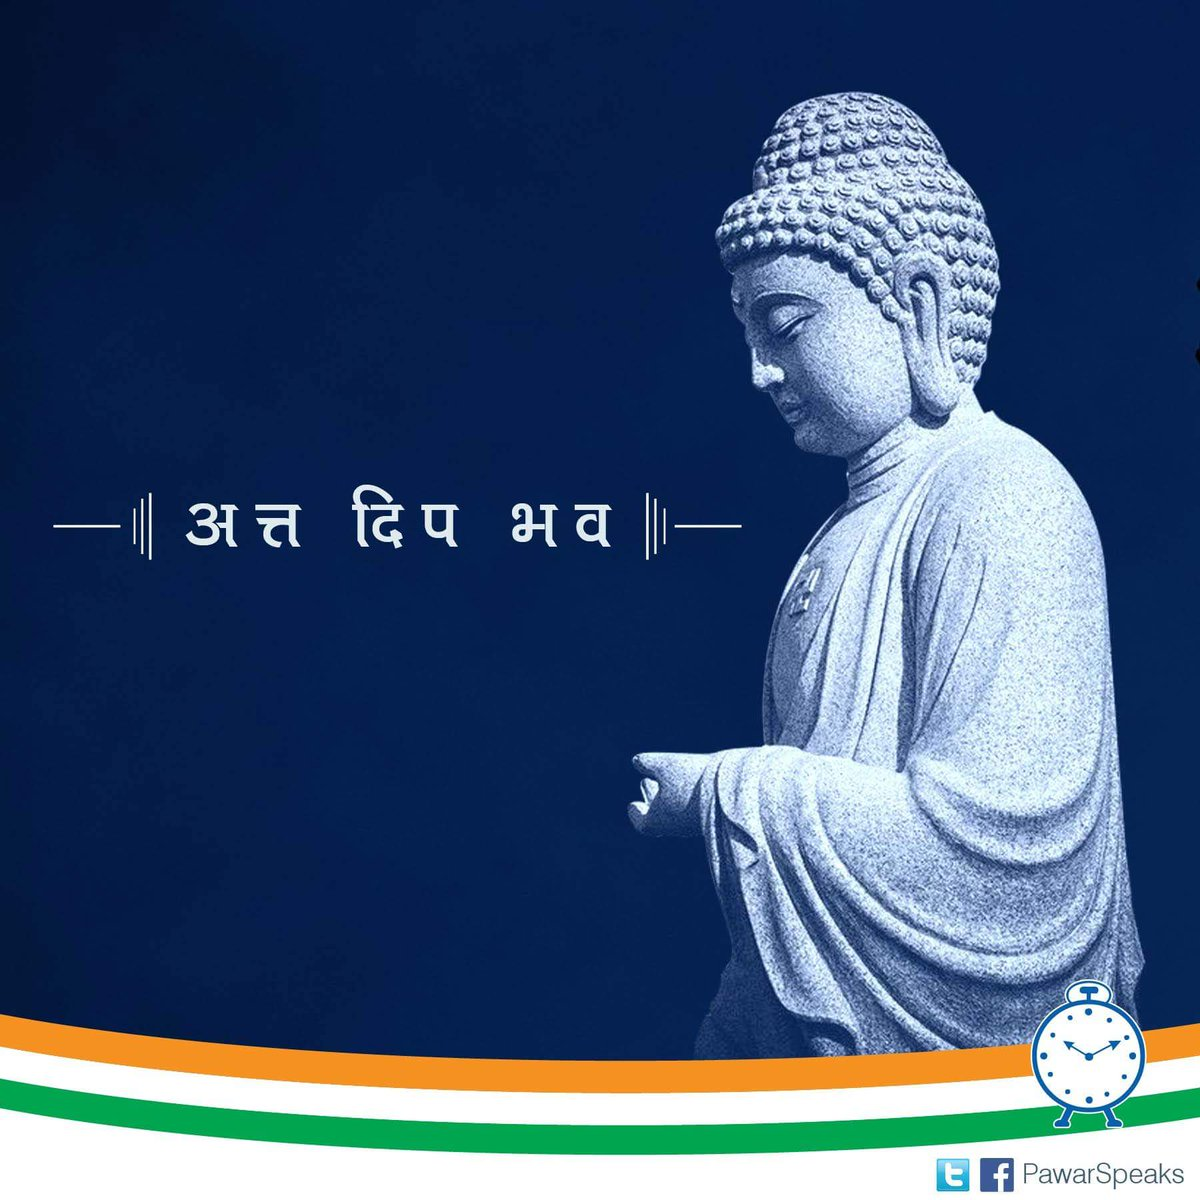 Sharad Pawar On Twitter Wishing You All Happy Buddha Pournima The